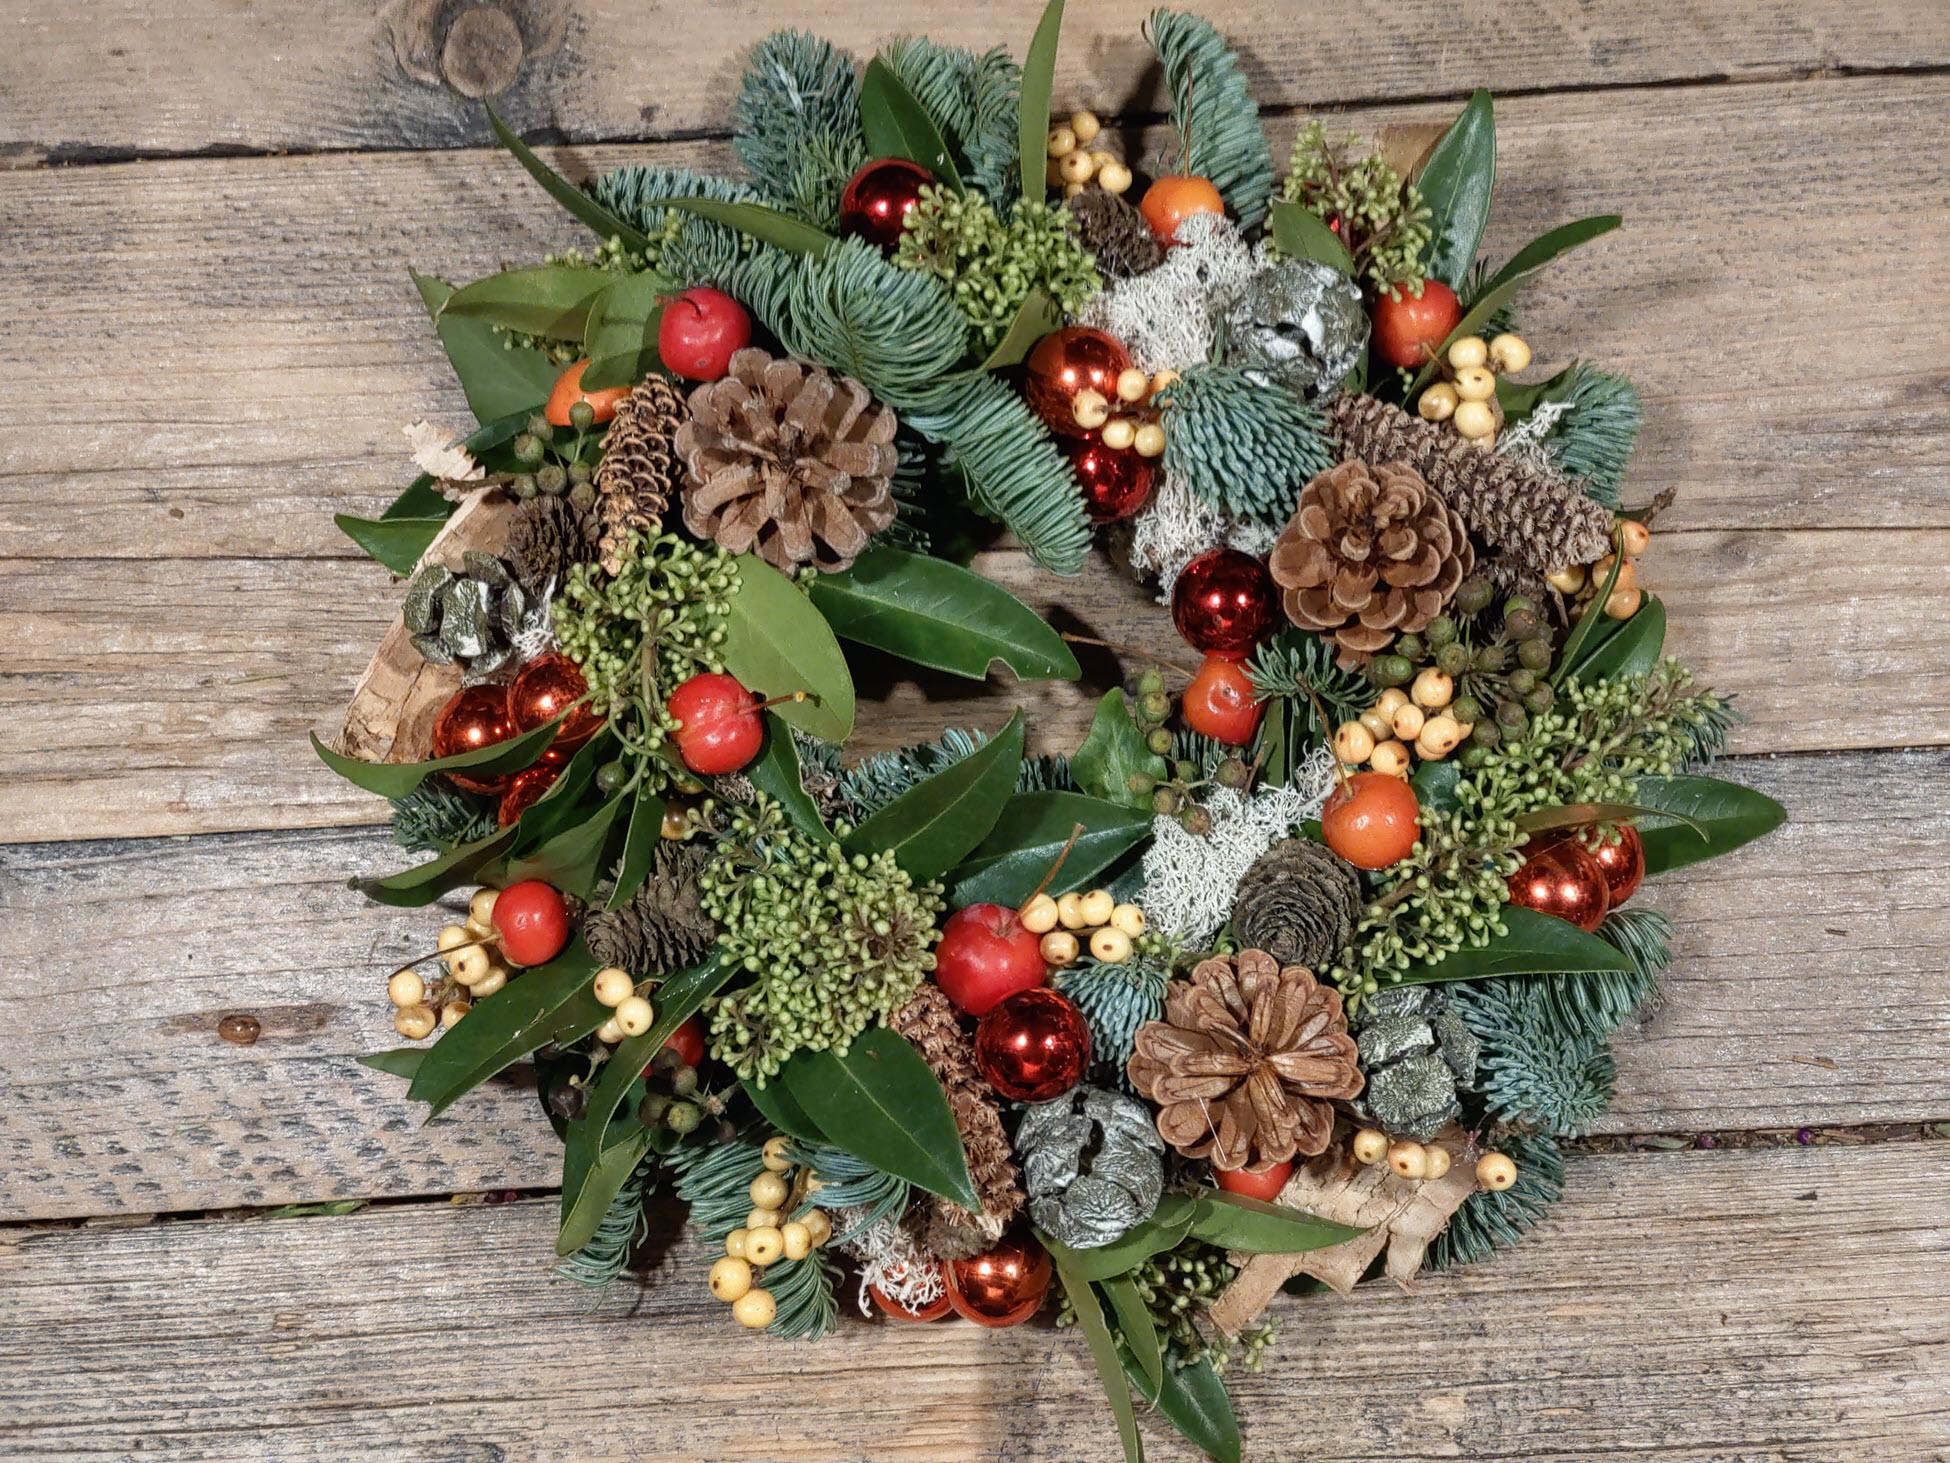 Bloemsierkunst Groeneveld kerst kerstkrans kerststukken